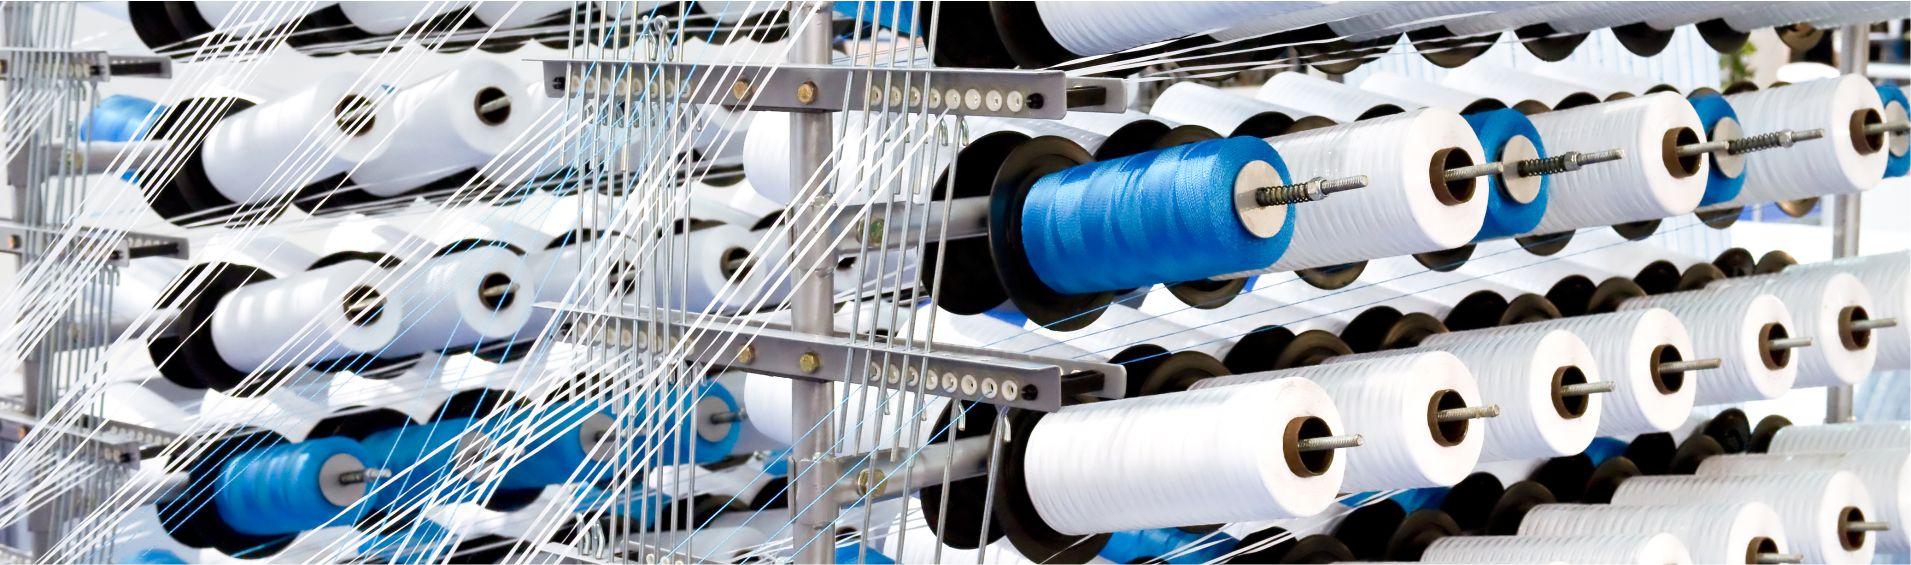 Textile manufacturing spool machine